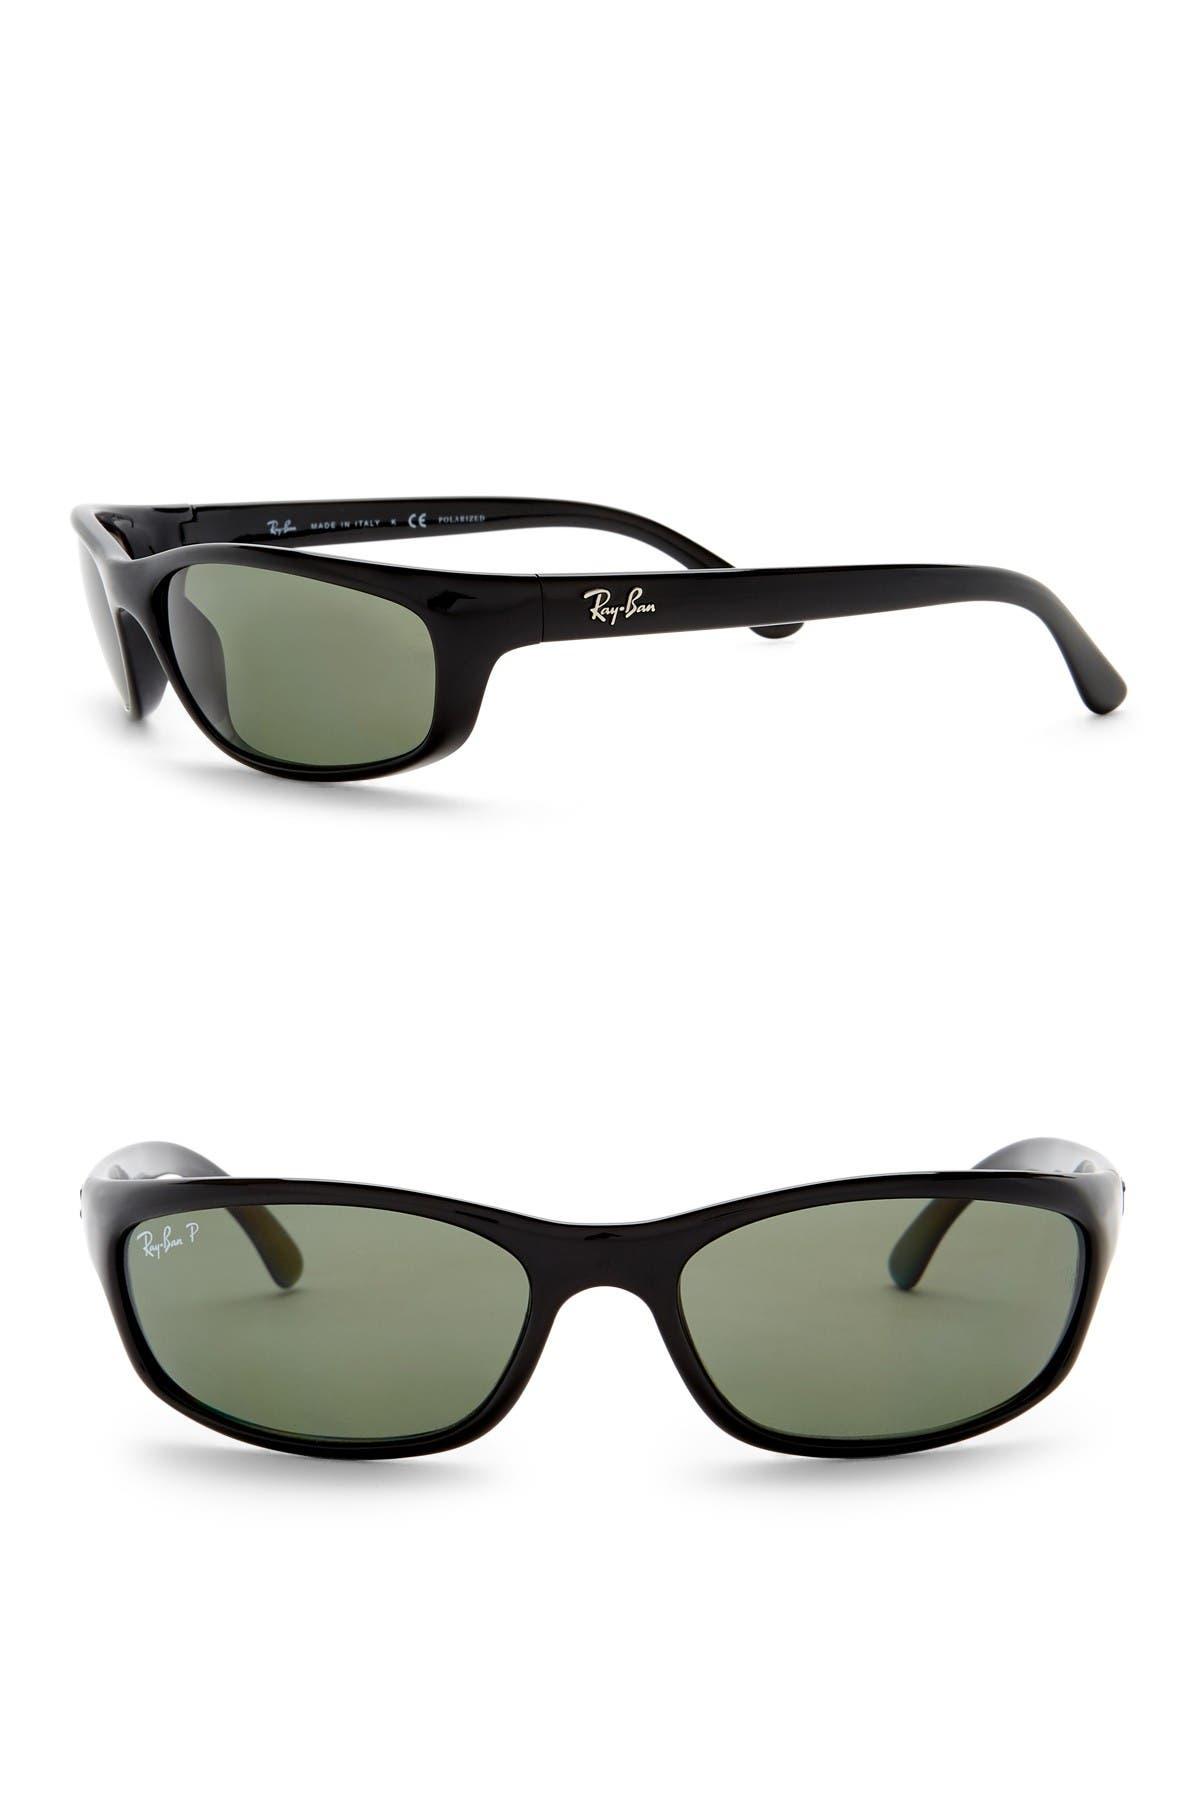 Image of Ray-Ban Polarized 57mm Wrap Acetate Sunglasses